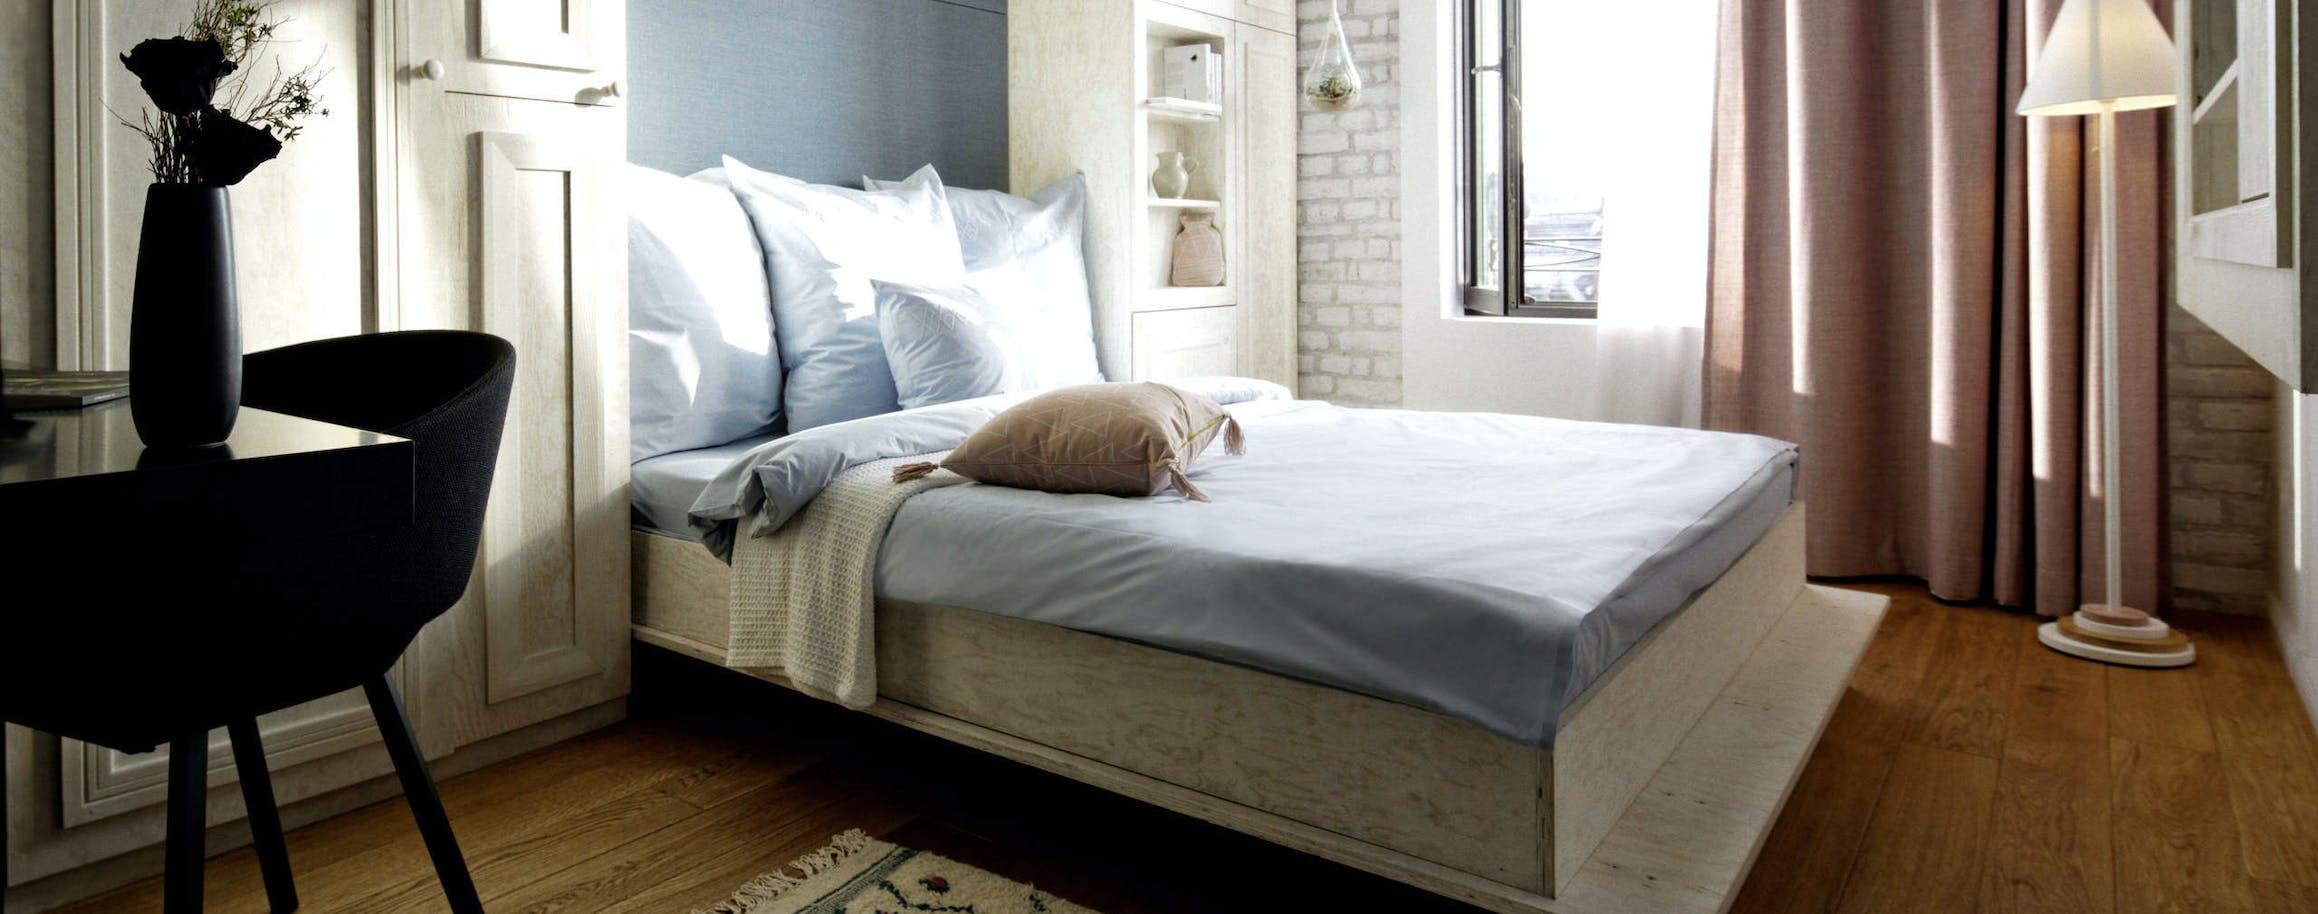 libertine lindenberg frankfurt hoteltonight. Black Bedroom Furniture Sets. Home Design Ideas